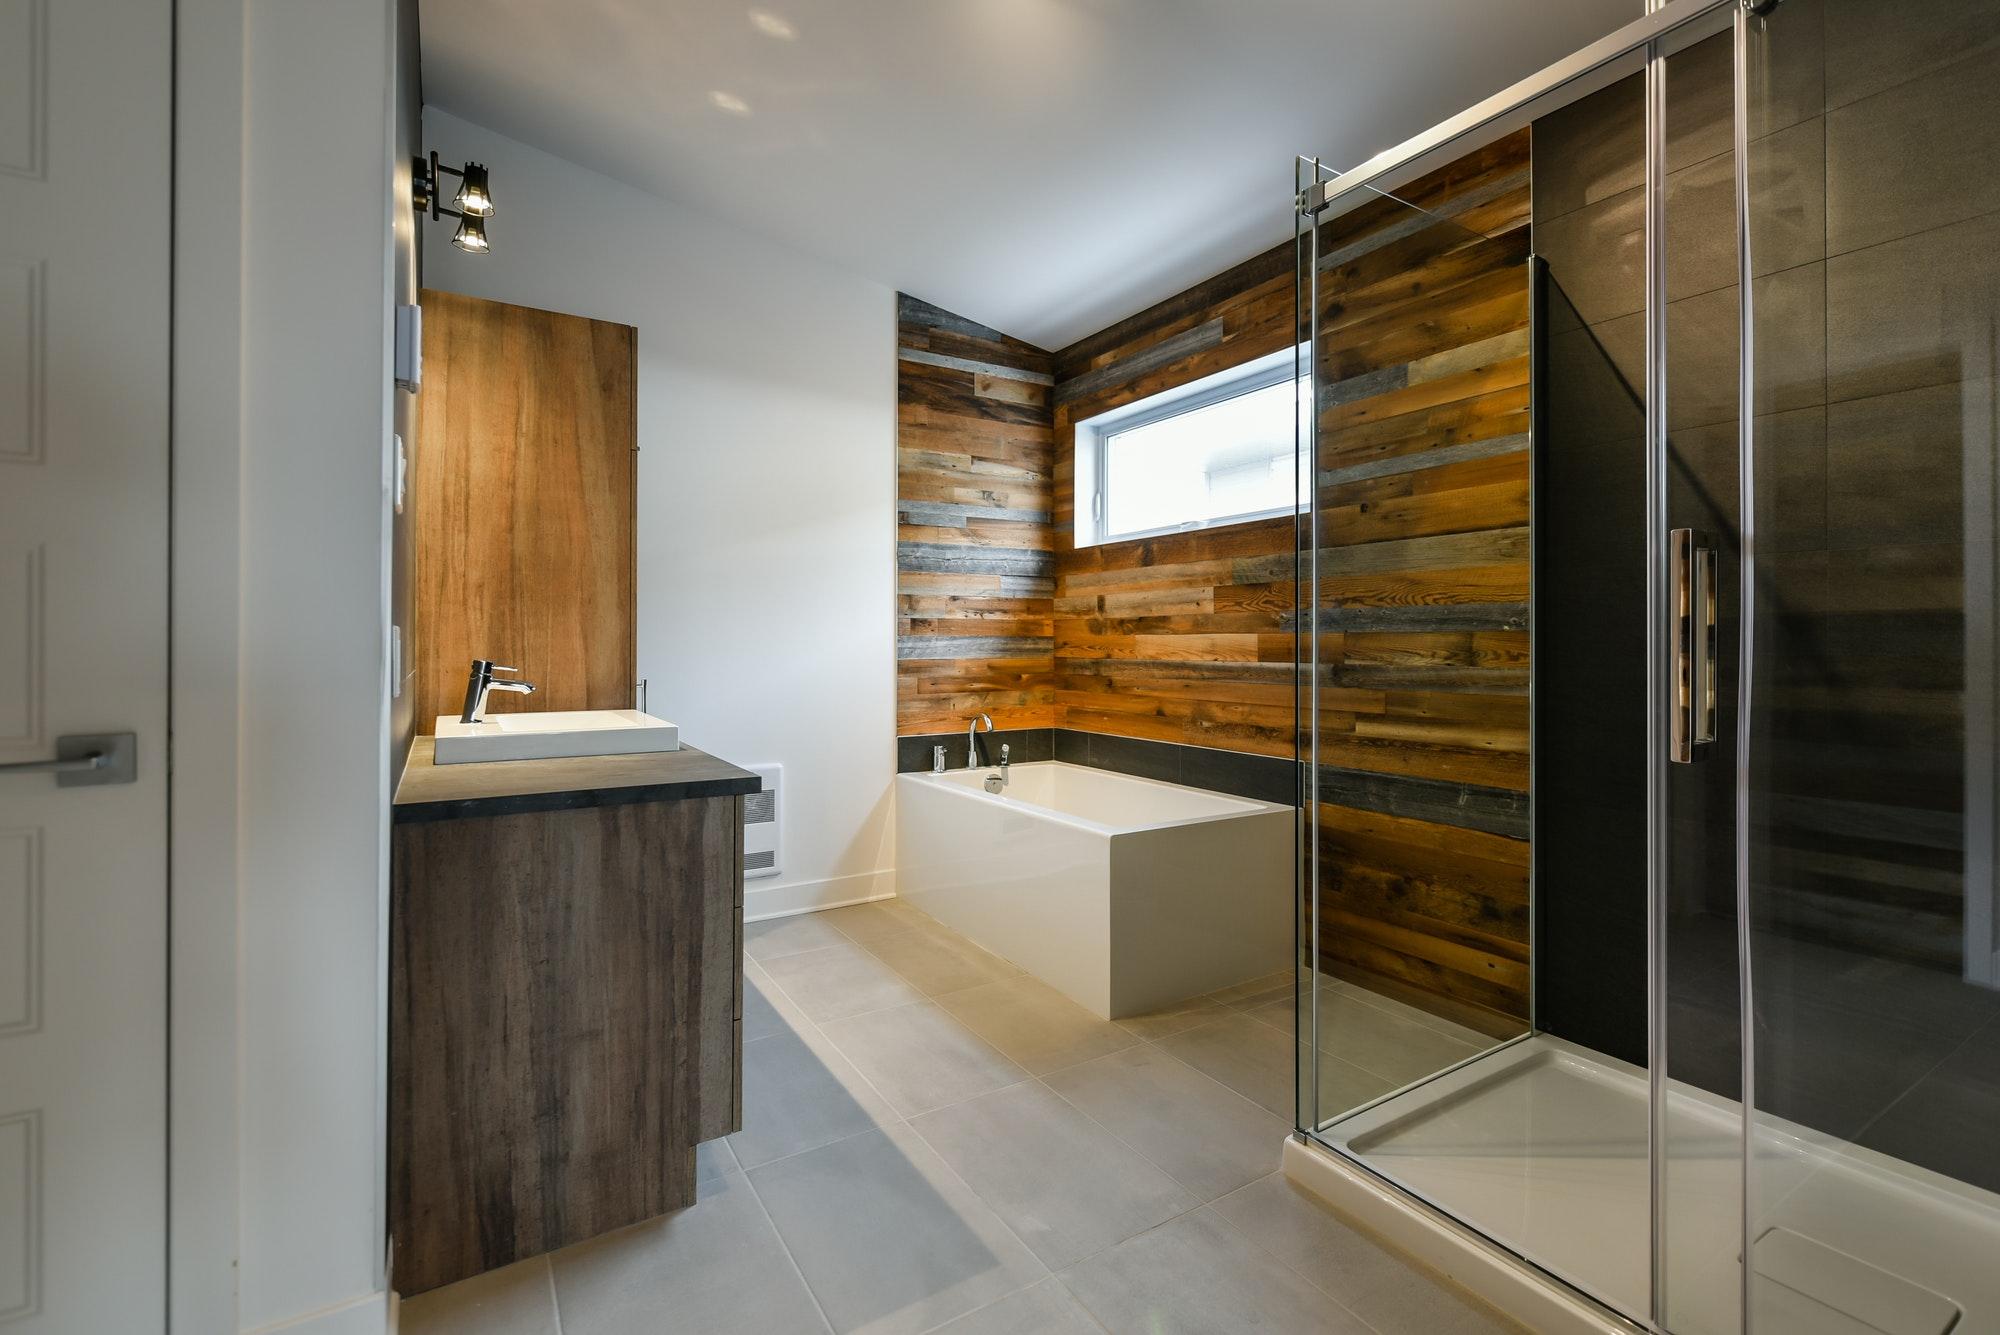 Modern bathroom with barn wood general view